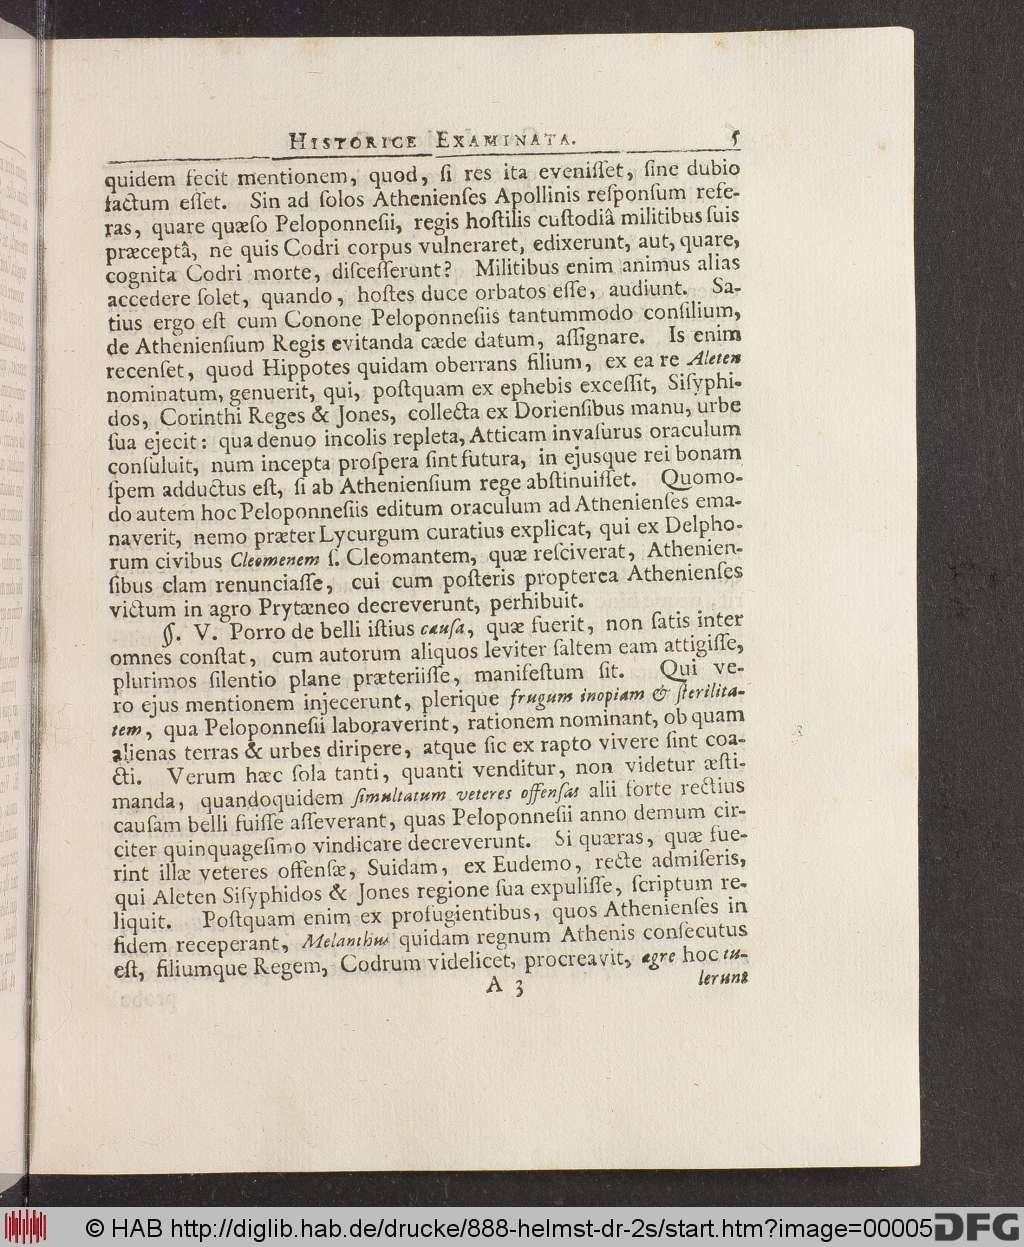 https://diglib.hab.de/drucke/888-helmst-dr-2s/00005.jpg